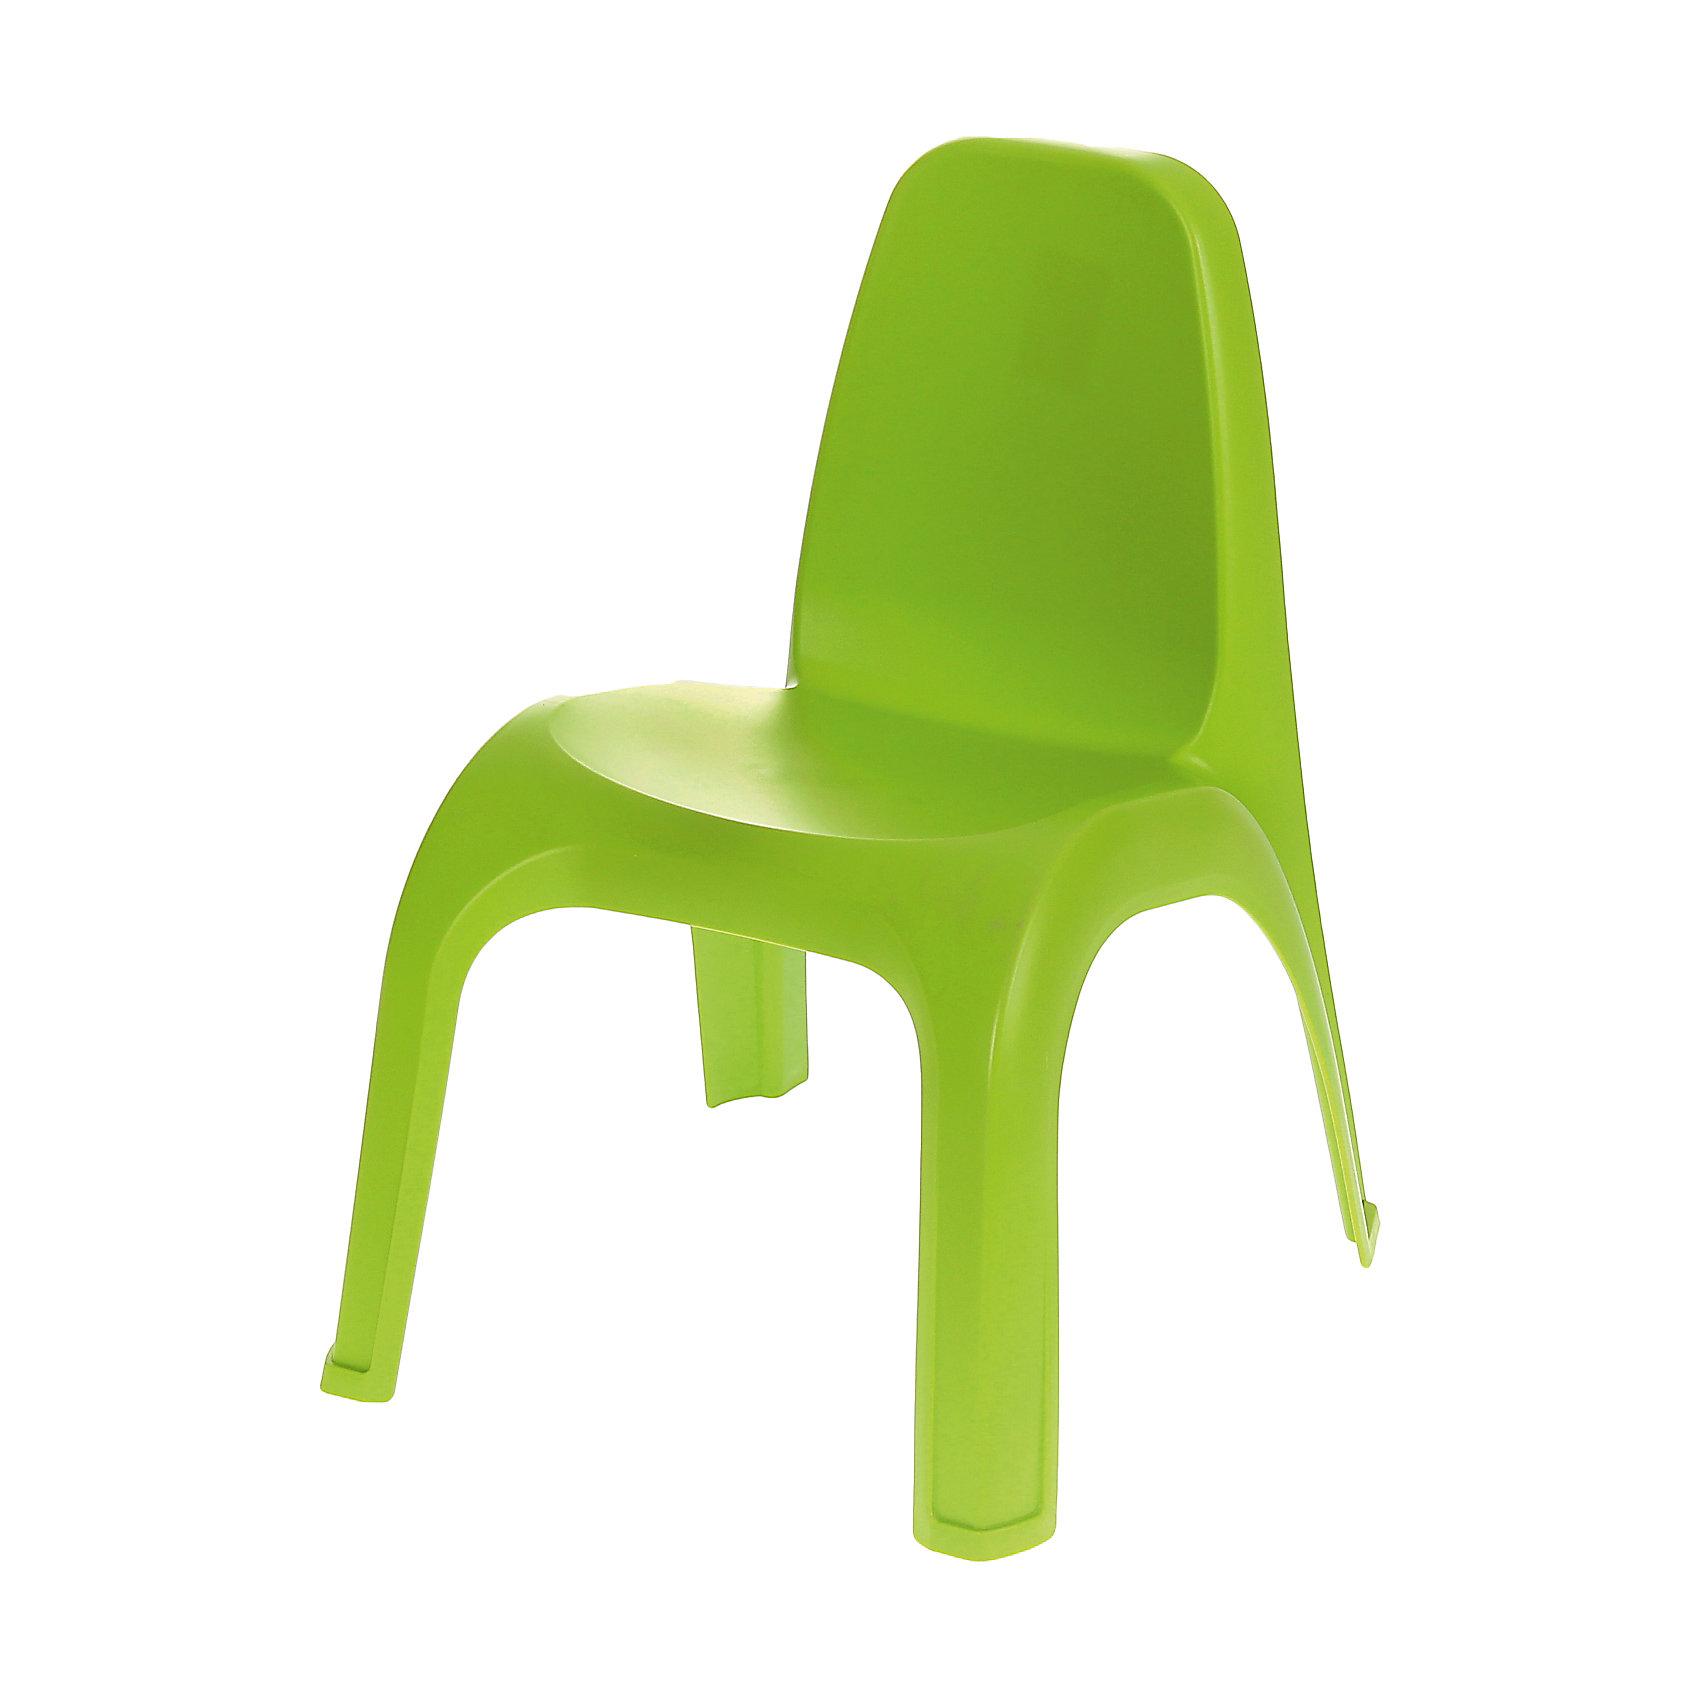 Пластишка Стул 380х425х525 мм, Пластишка, зелёный пластишка горка для купания детей пластишка